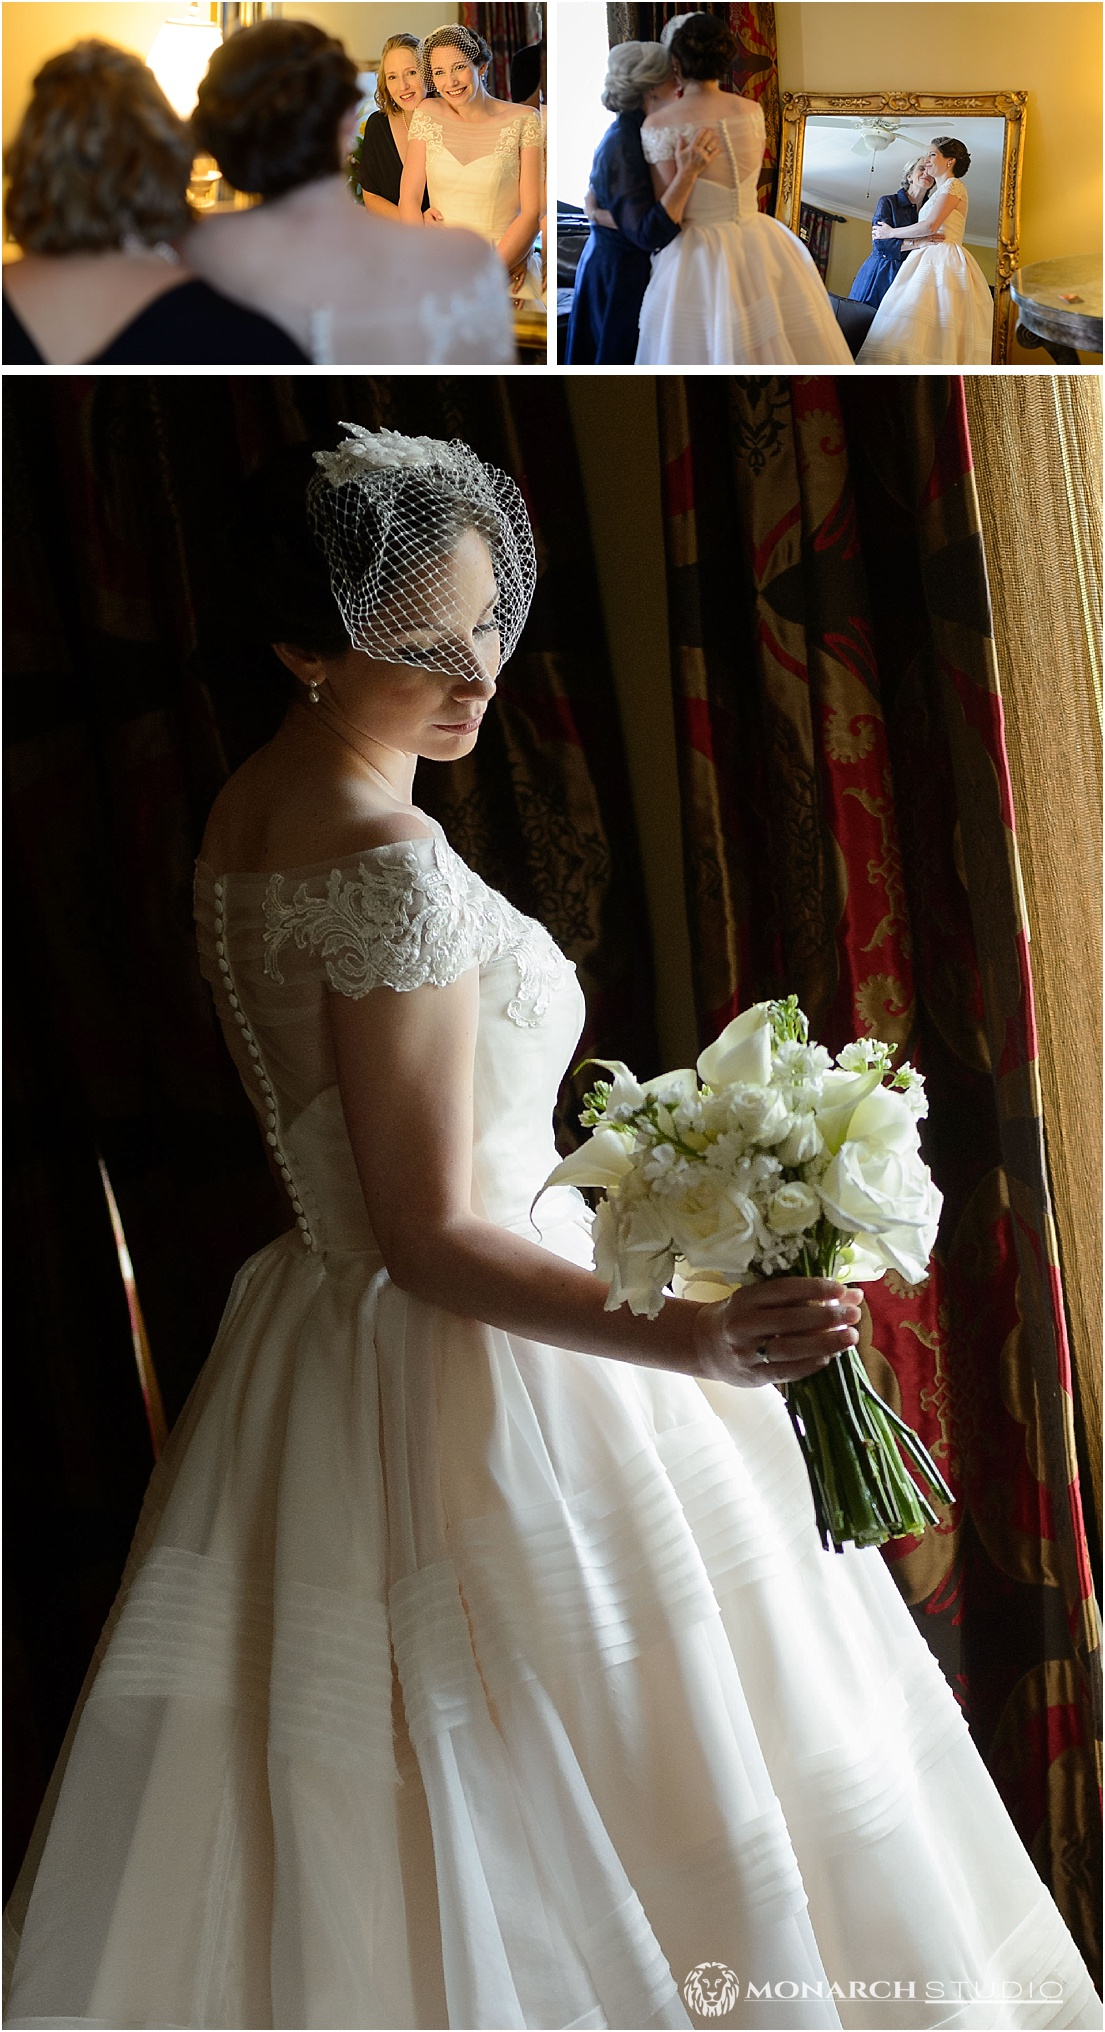 011-st-augustine-wedding-photographer-.jpg